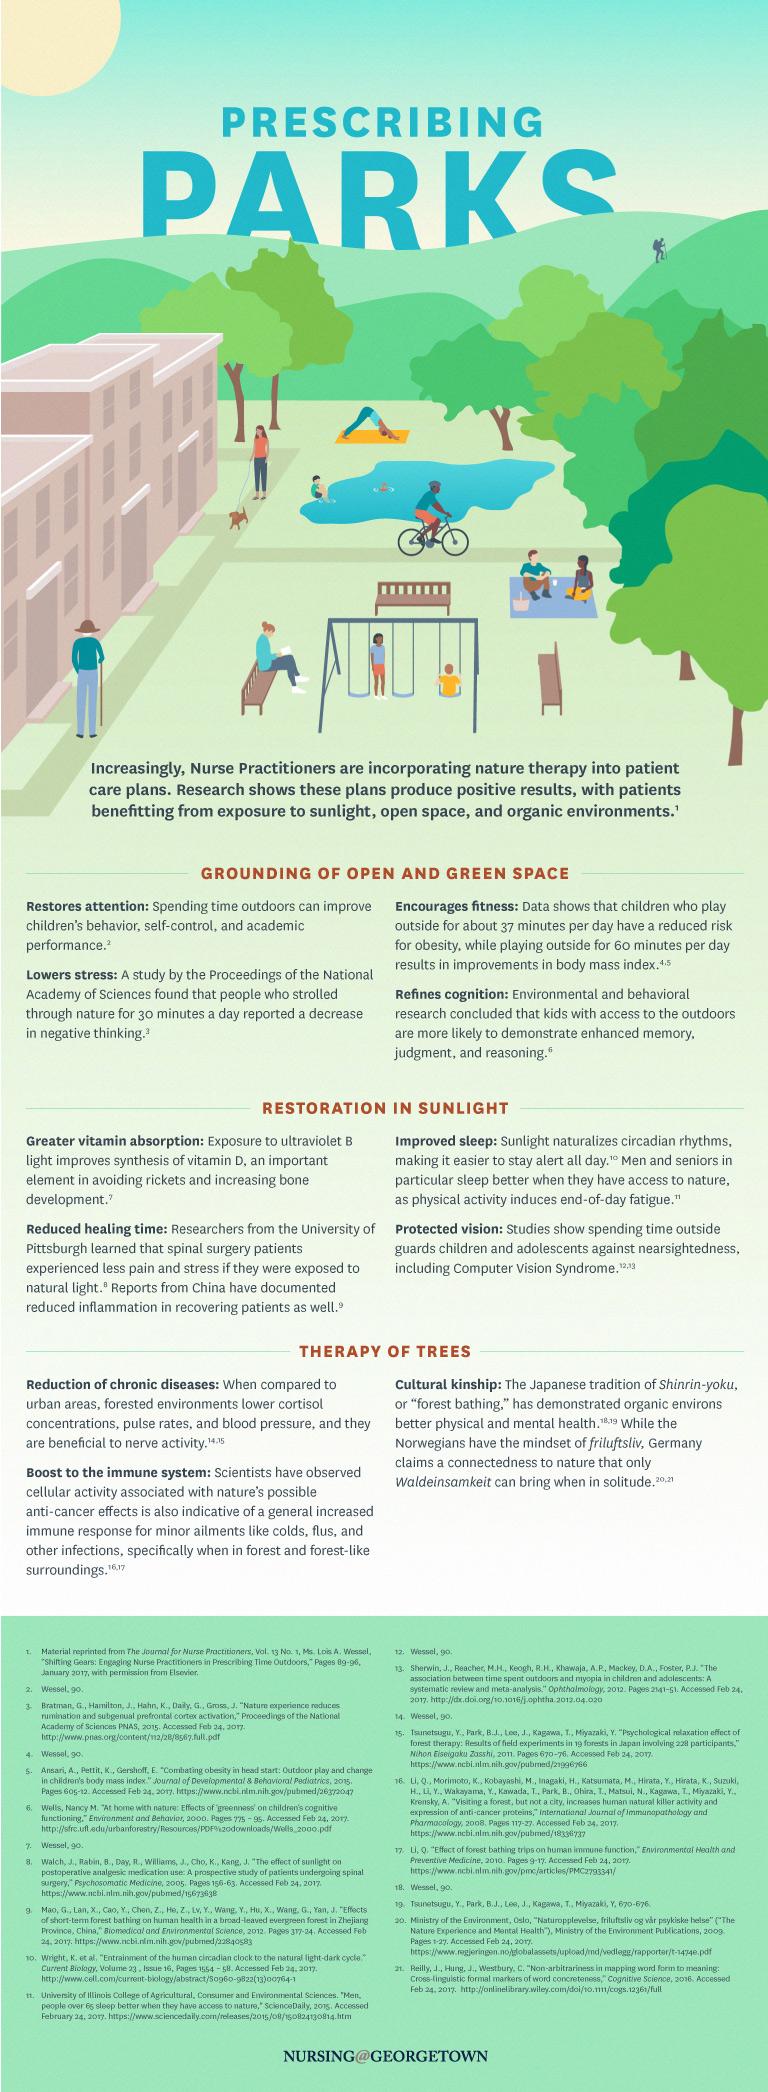 prescribing_parks_infographic